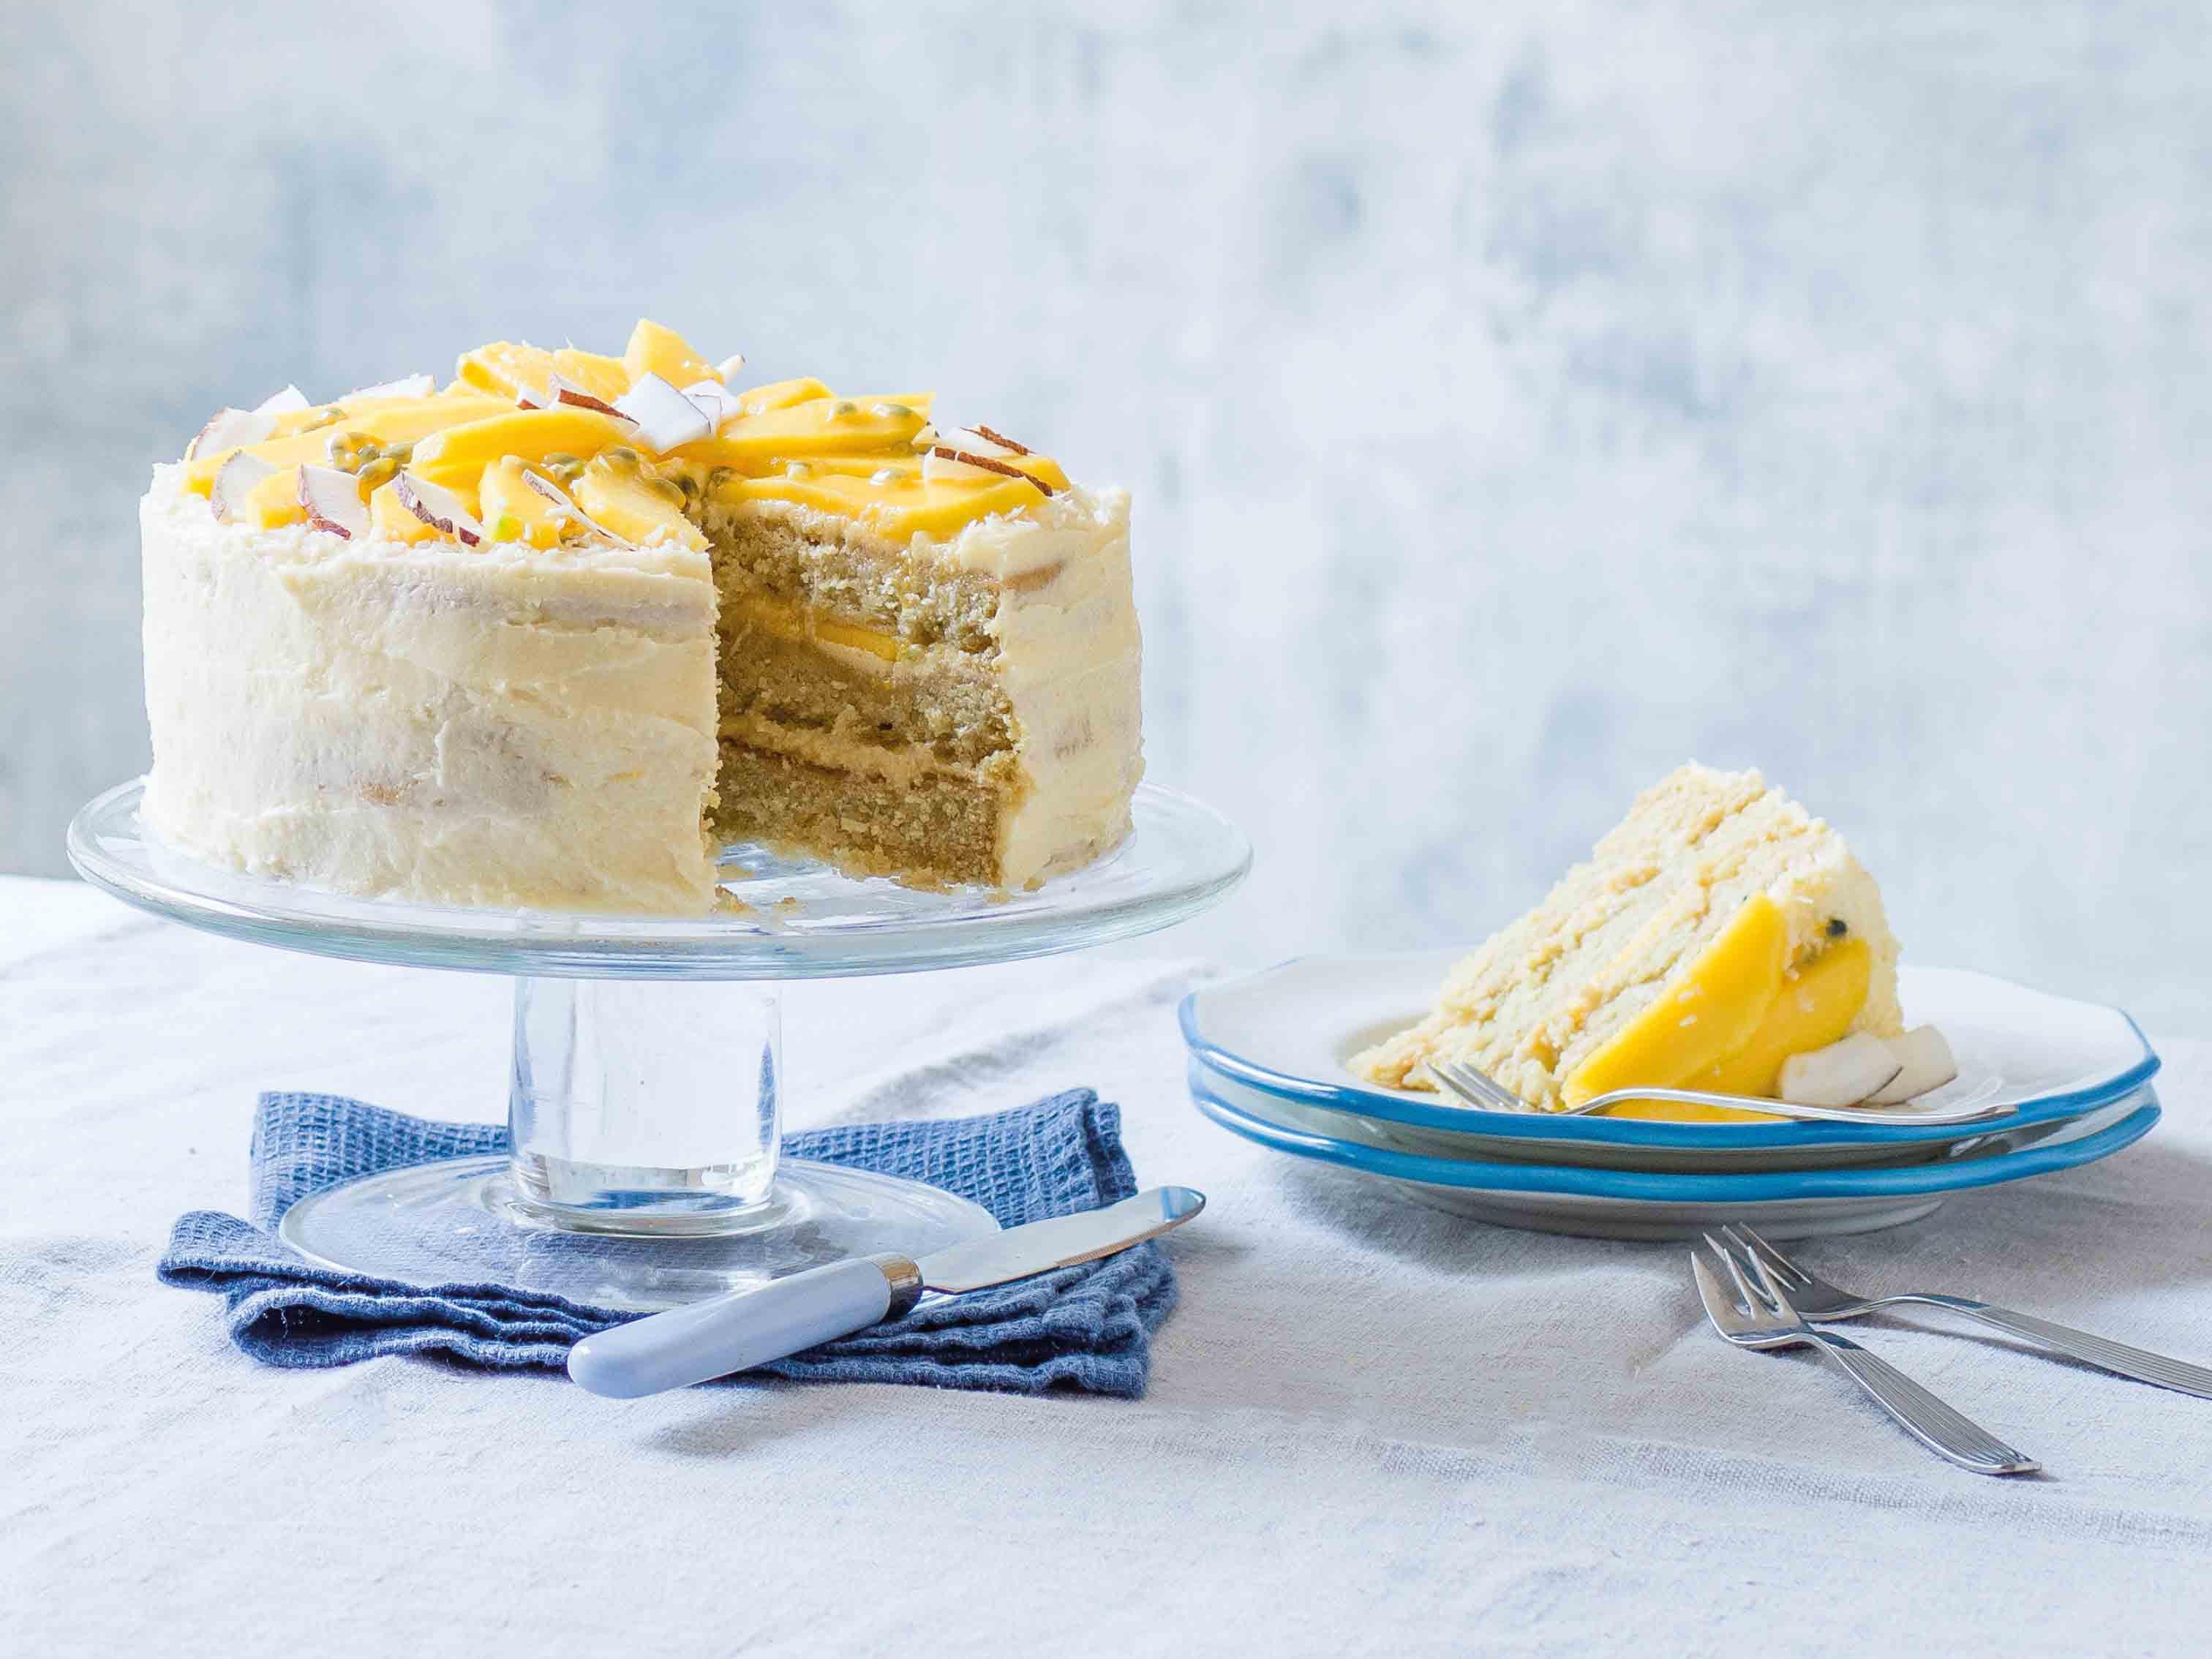 Best ideas about Vegan Birthday Cake Recipe . Save or Pin Vegan Birthday Cake Birthday Cake Recipes Now.